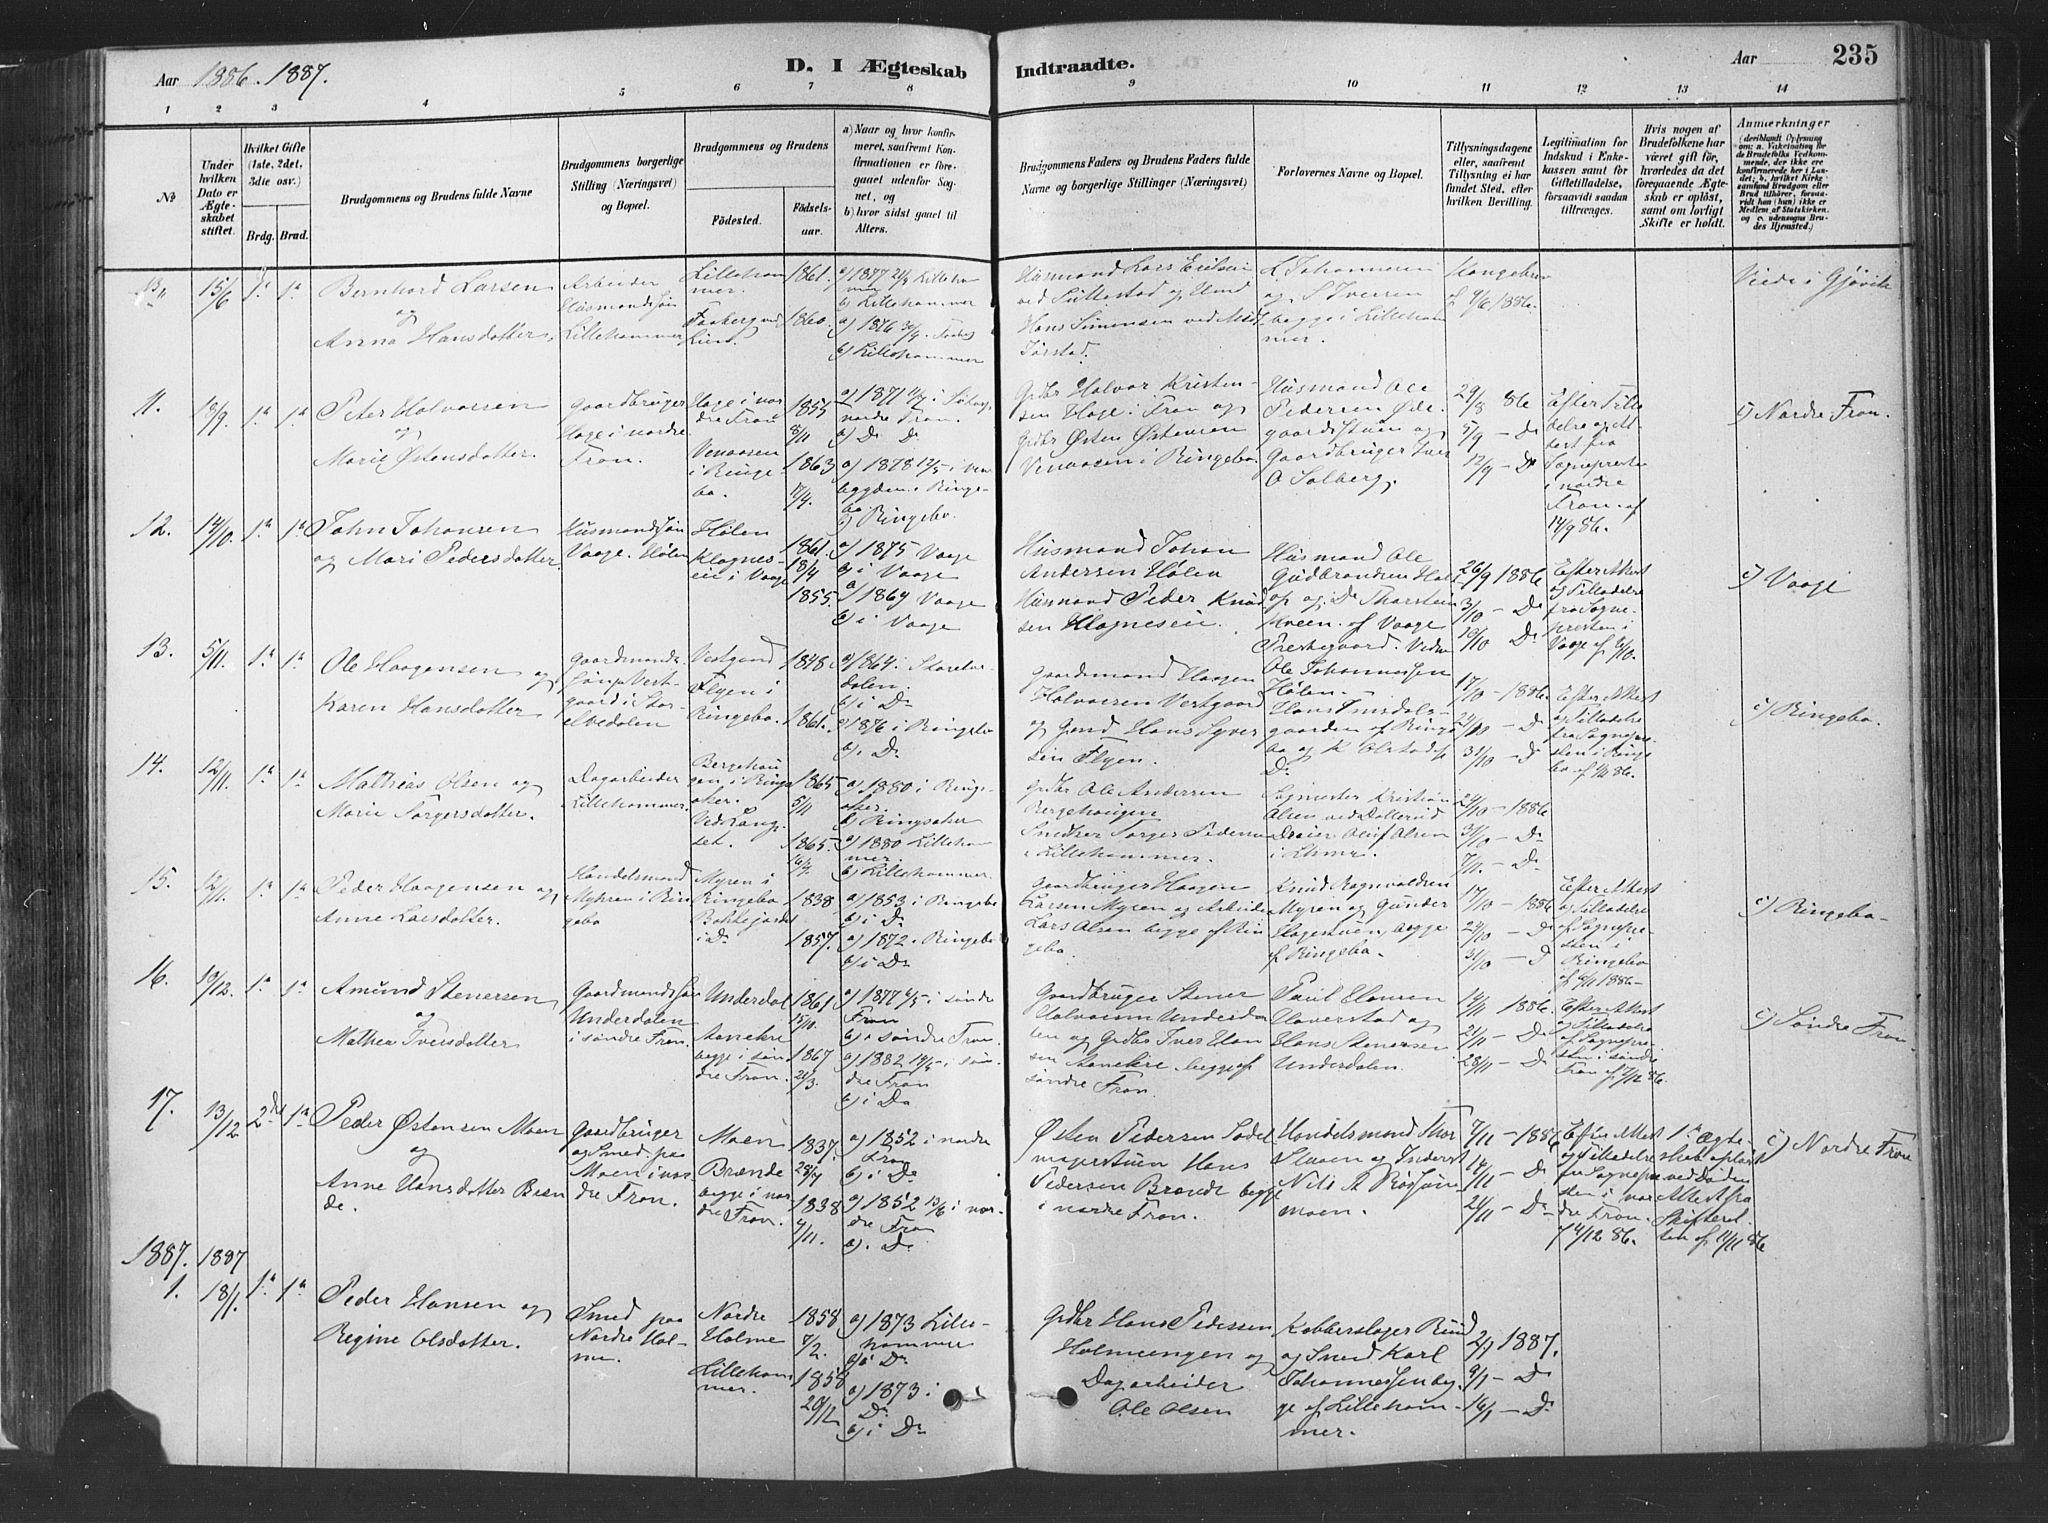 SAH, Fåberg prestekontor, Ministerialbok nr. 10, 1879-1900, s. 235